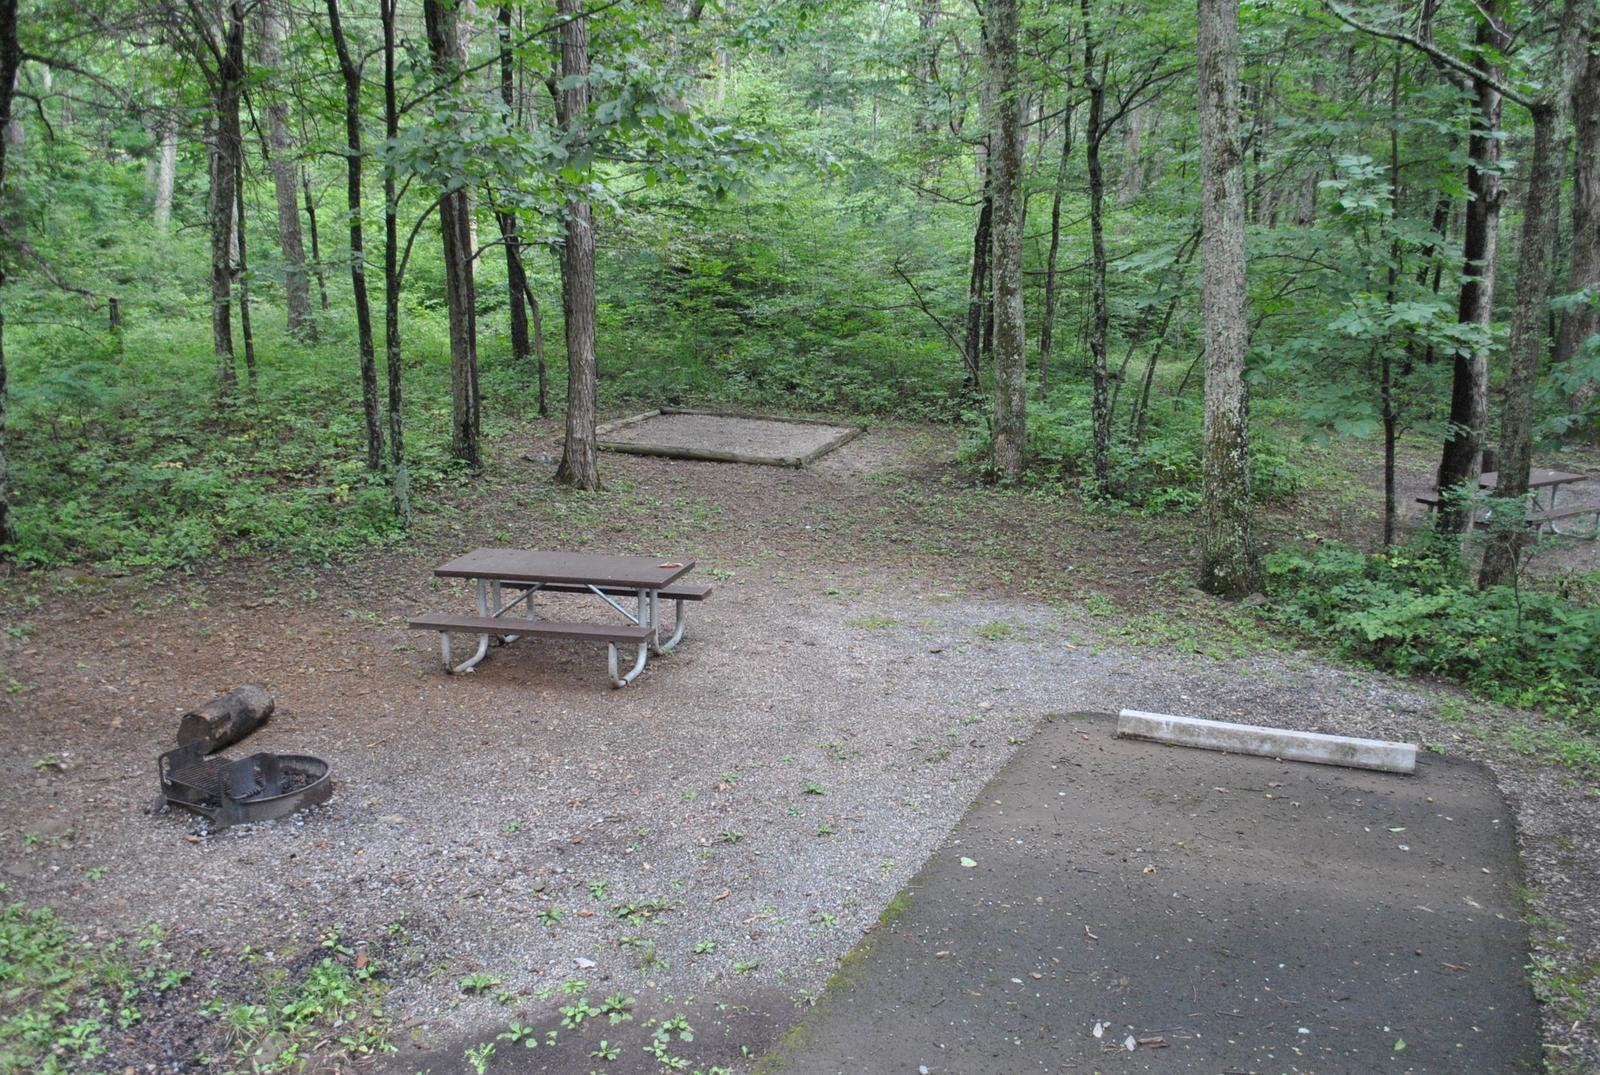 Mathews Arm Campground – Site A019